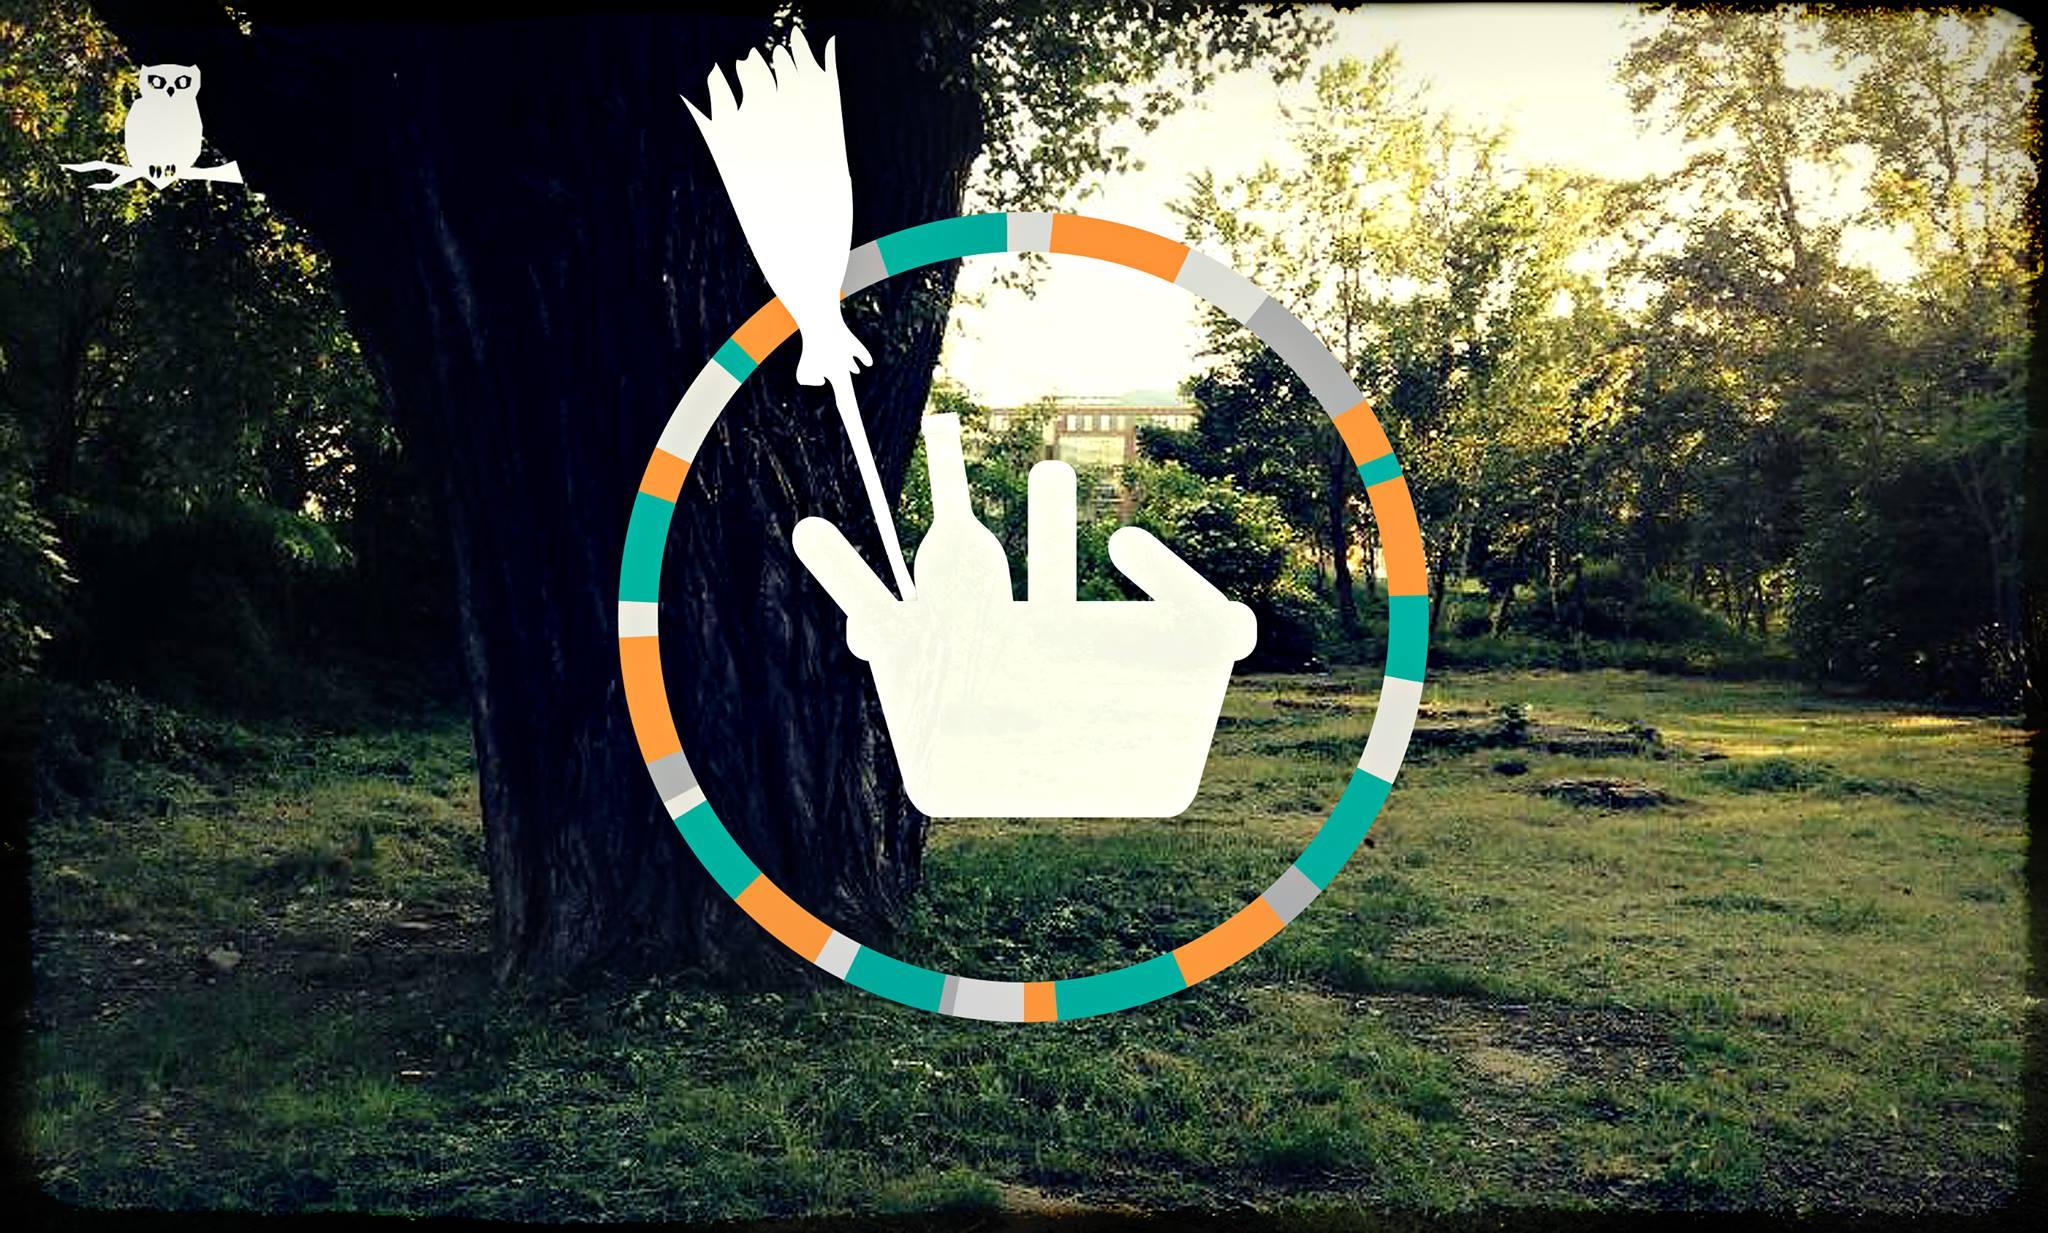 čarodějnický piknik